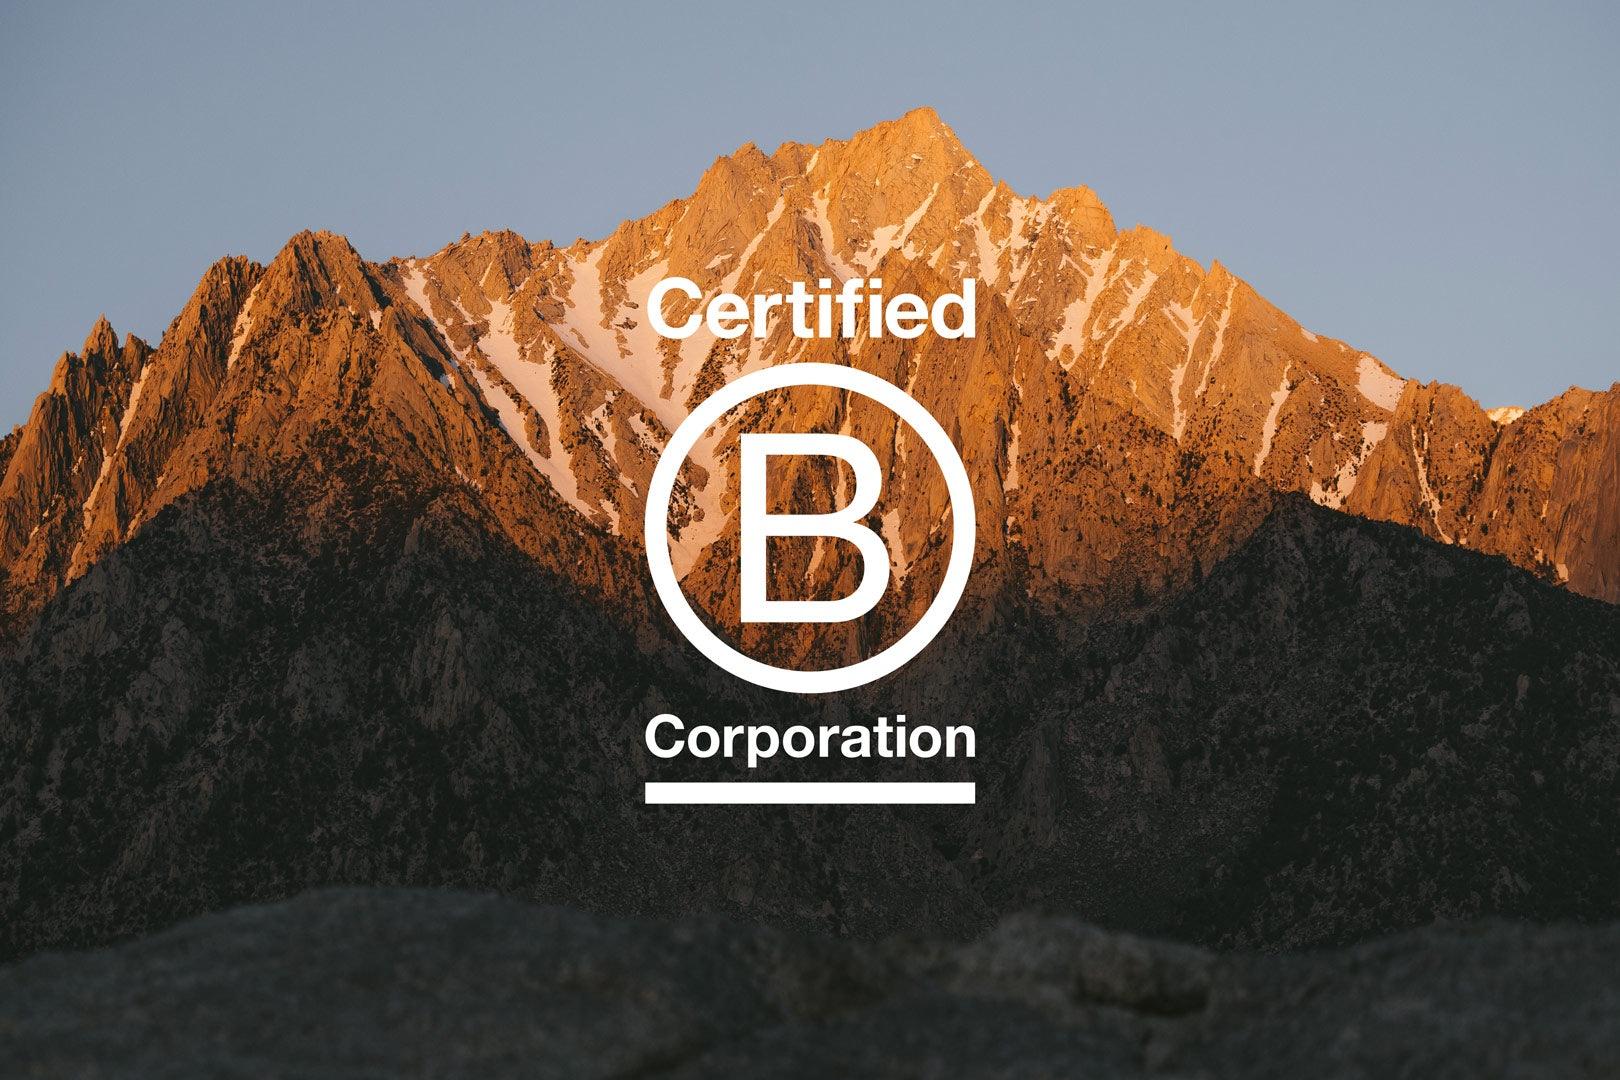 Tillak - Certified B Corporation®